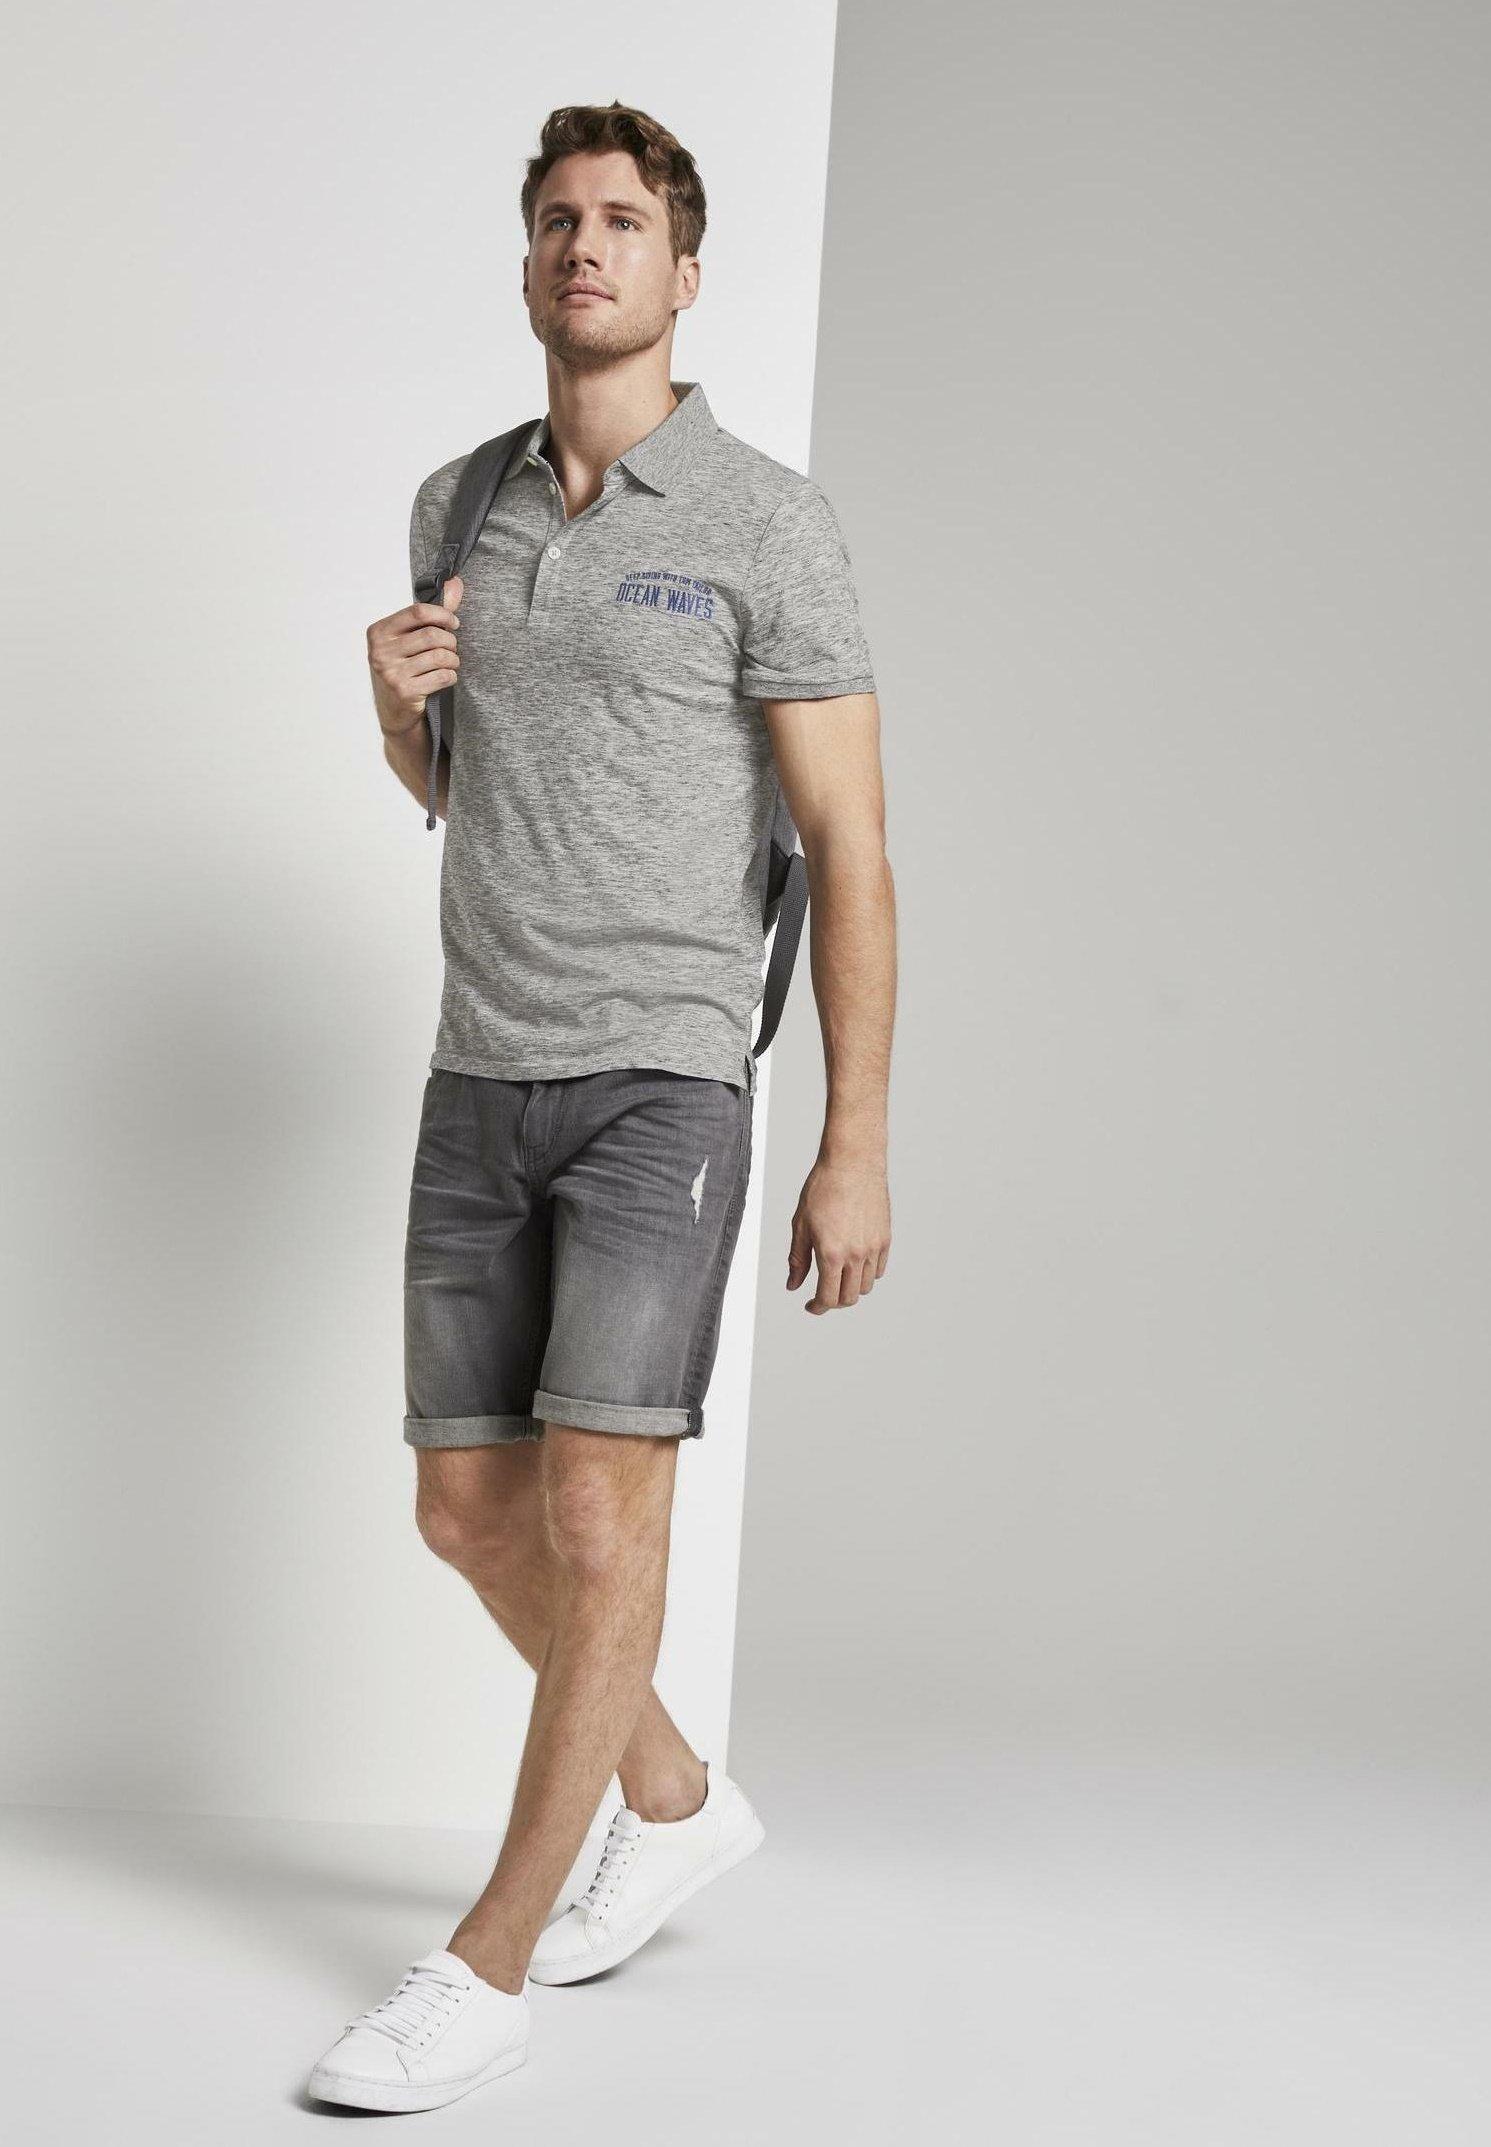 Große Förderung TOM TAILOR Poloshirt - grey coloured melange | Damenbekleidung 2020